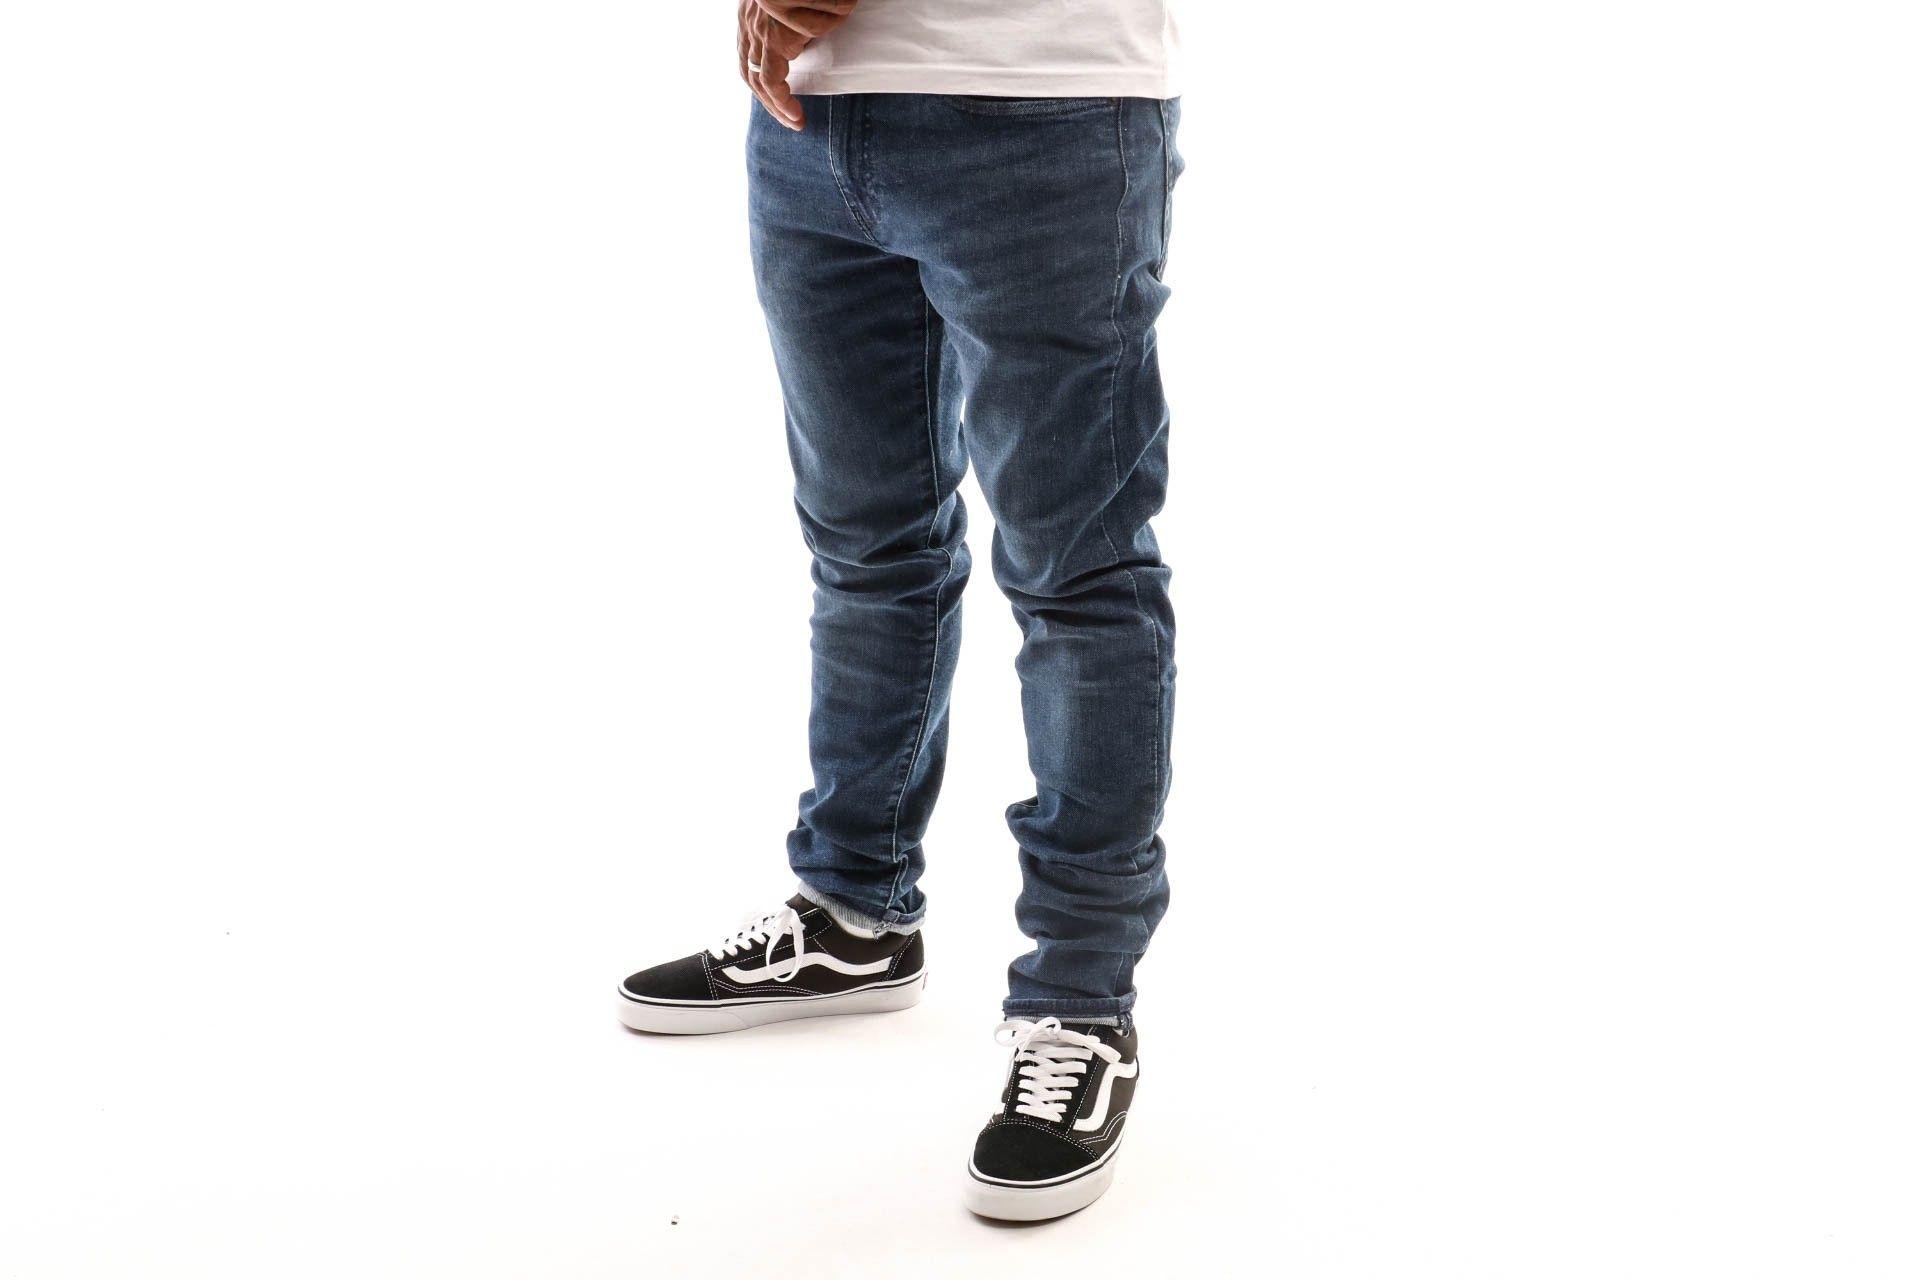 Afbeelding van Levi's 512™ Slim Taper Fit 28833-0405 Jeans Sage Overt Adv Tnl